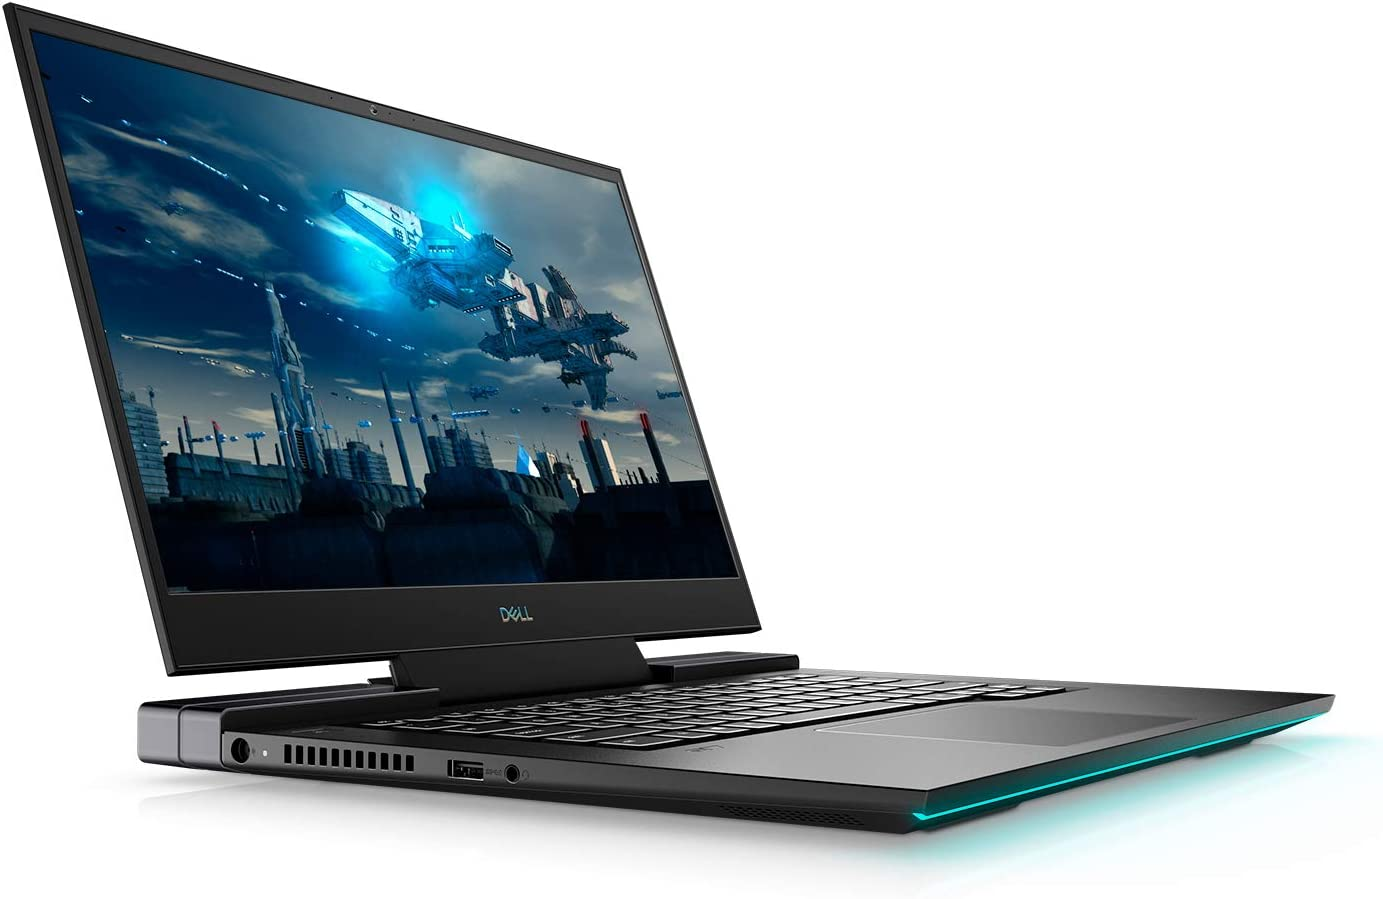 "New G7 17 Gaming Laptop 10th Gen Intel i7-10750H GeForce RTX 2070 8GB 17.3"" FHD Display 300Hz + Best Notebook Pen Light (1TB SSD 64GB Ram 10 Pro)"